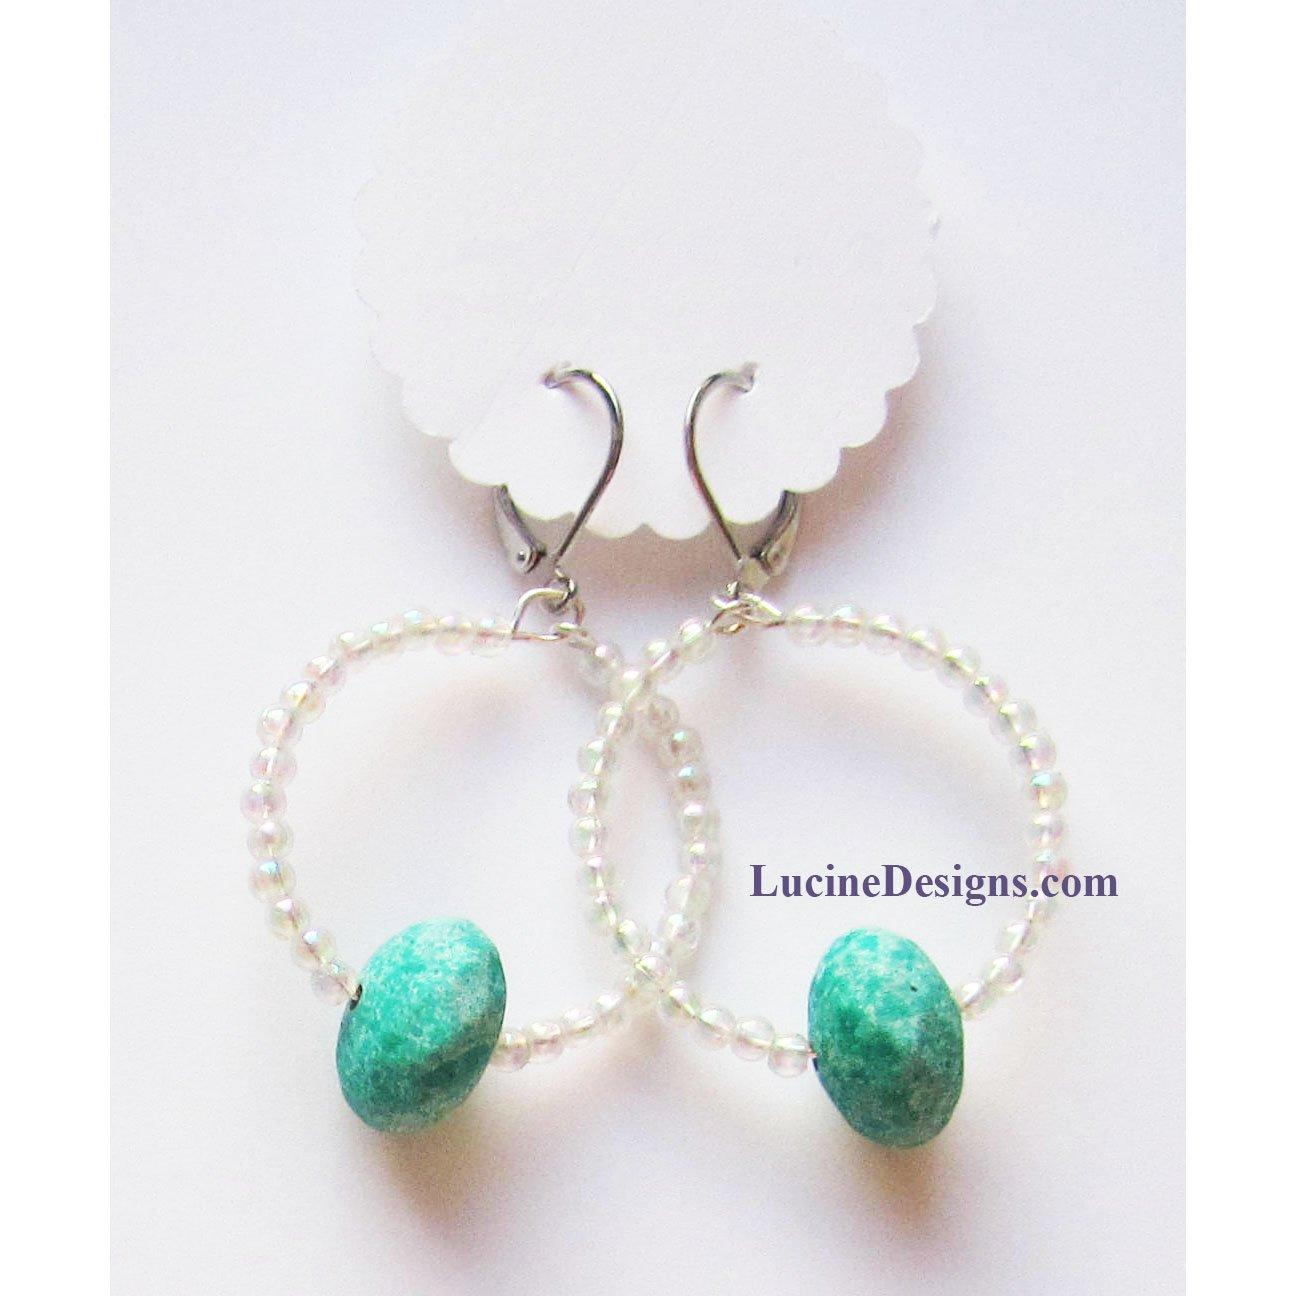 Turquoise fashion drop earrings